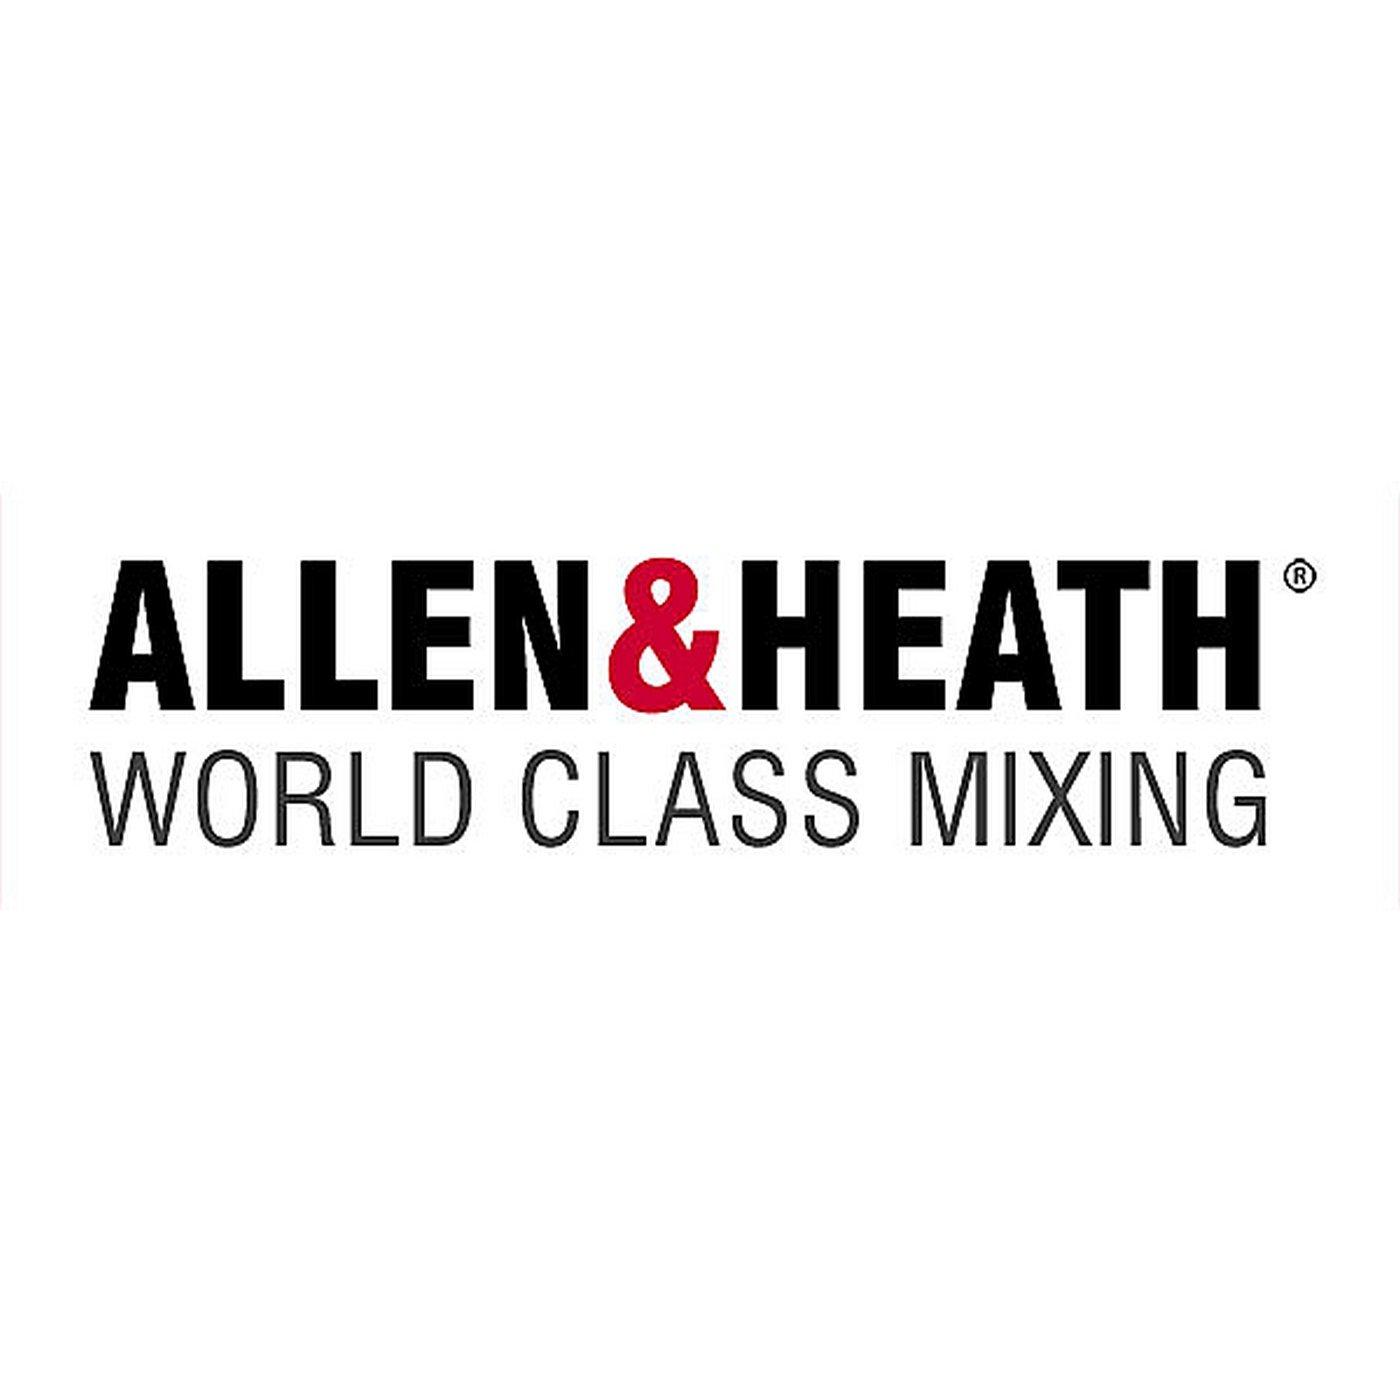 Allen & Heath Dust Cover for Qu-32 Mixer